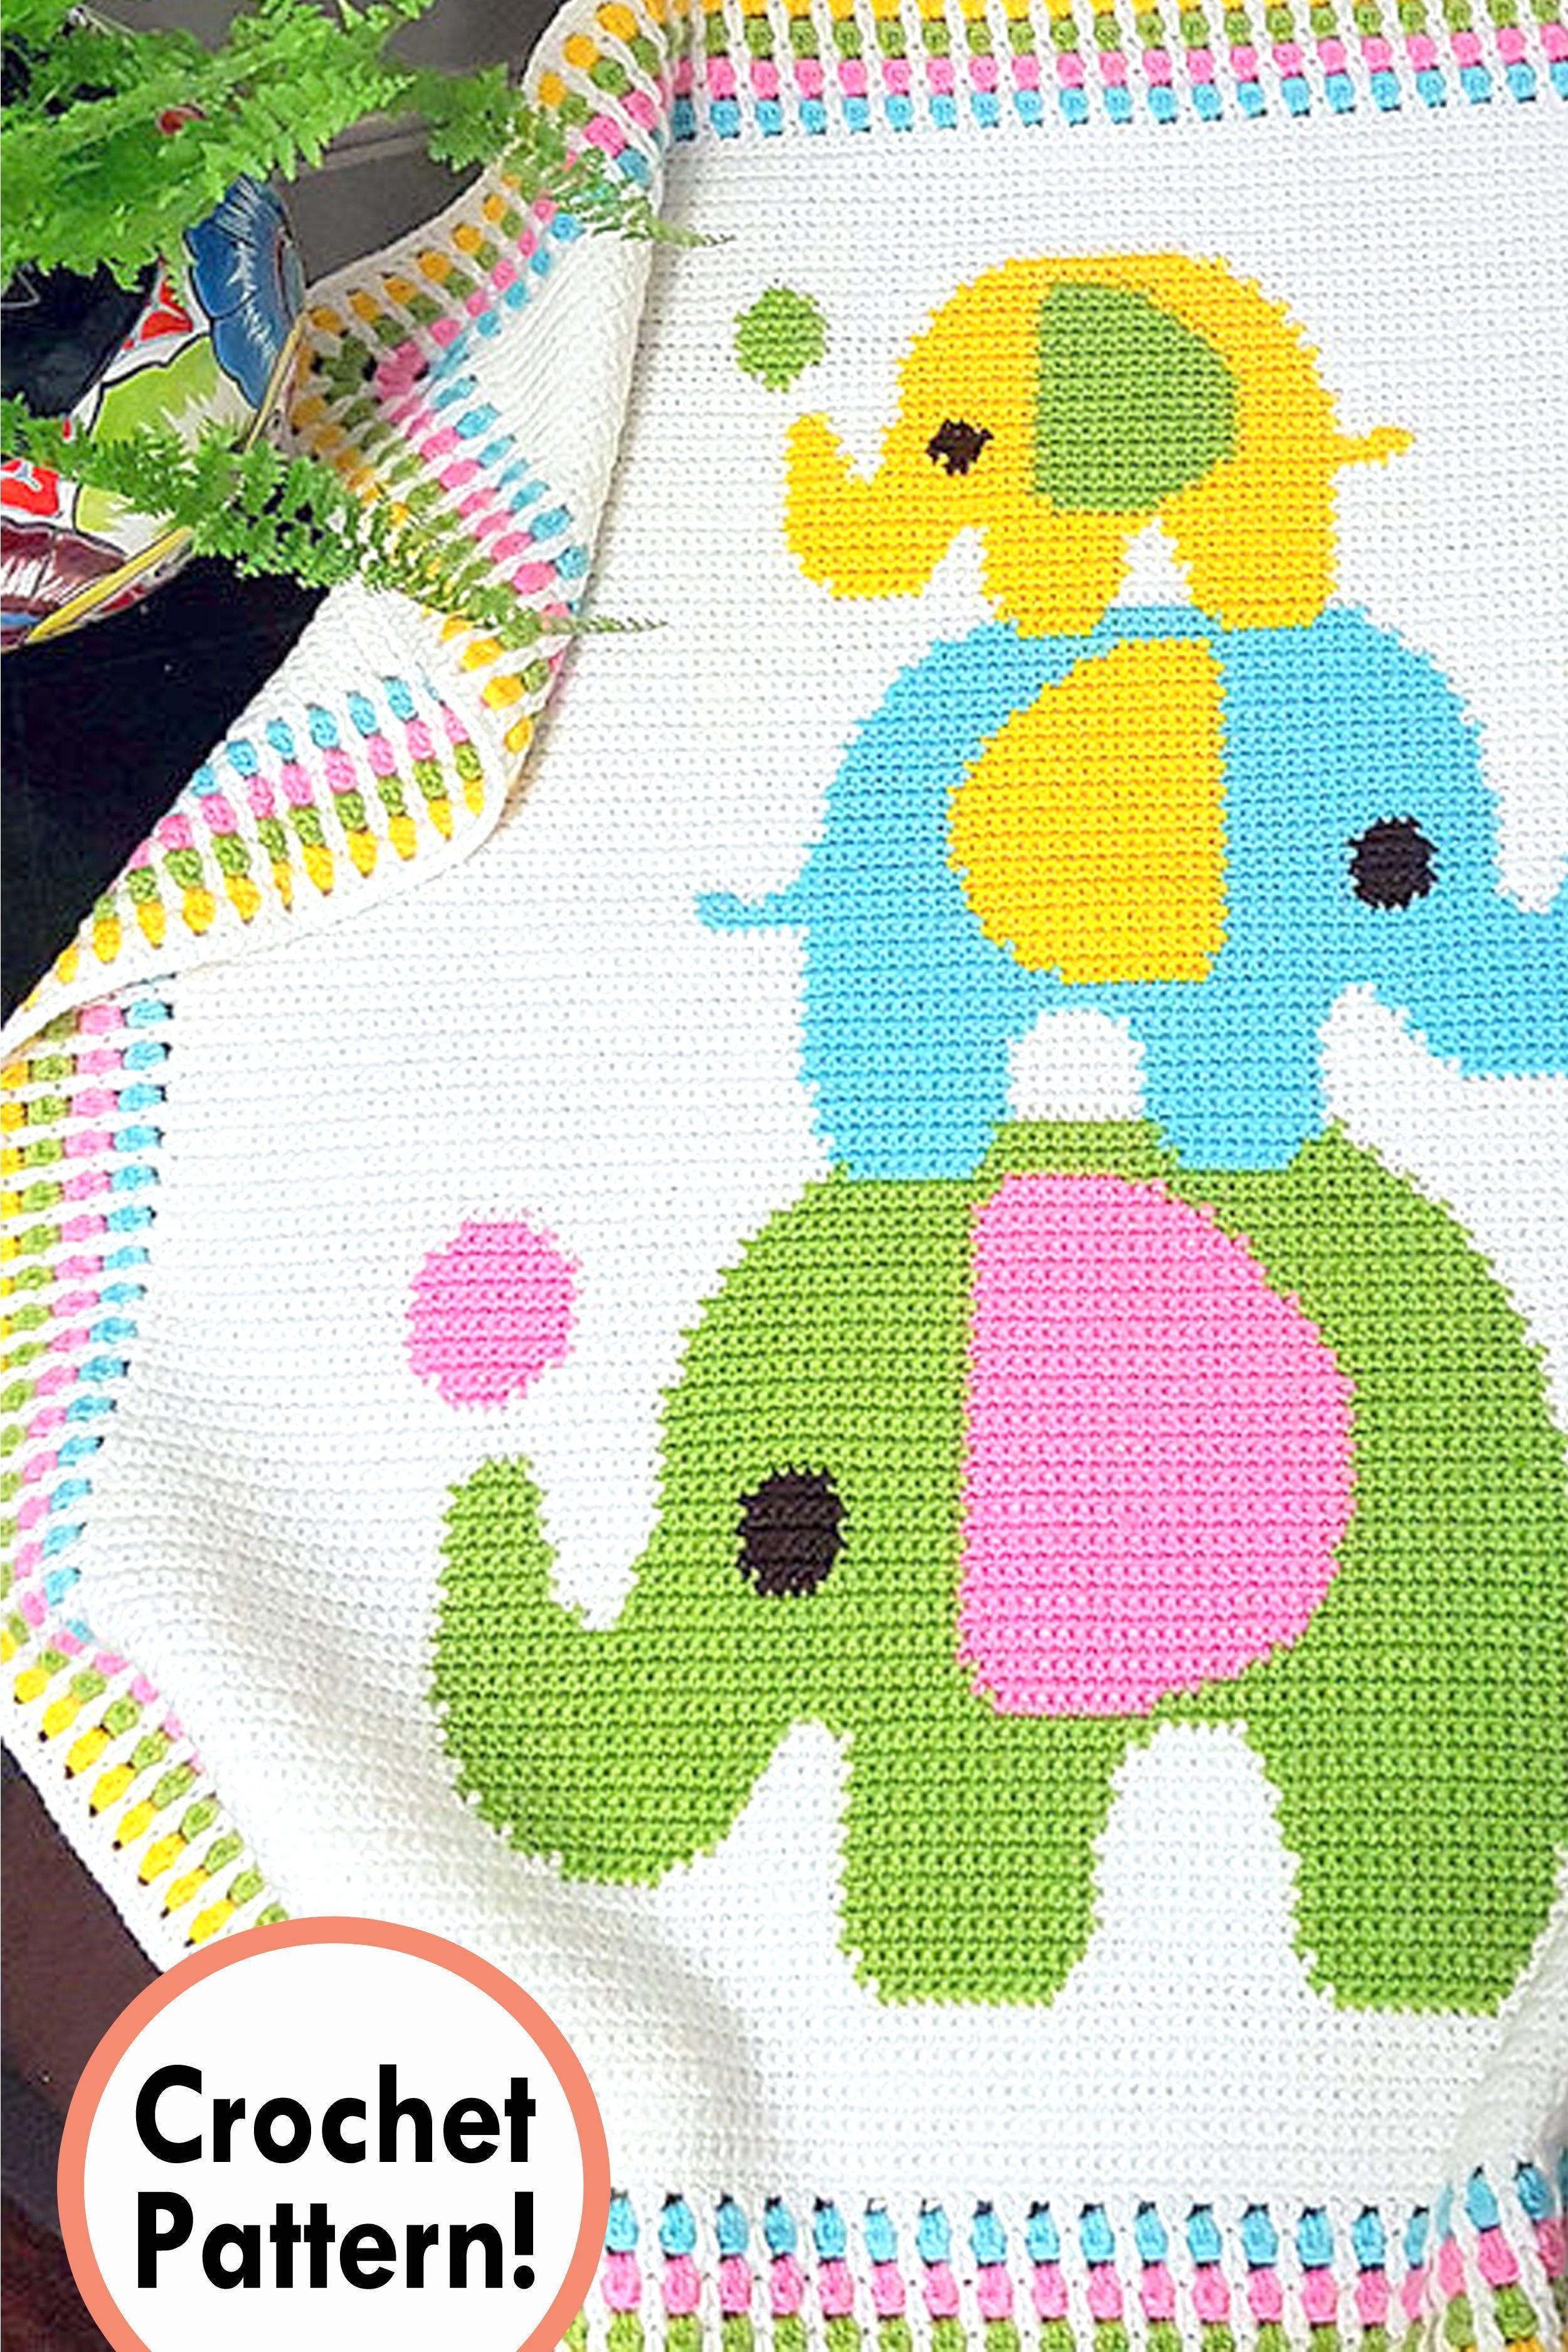 #Baby #Blanket #Crochet #Elephant #Pattern Elephant baby blanket Crochet pattern, crochet Elephant baby blanket, crochet afghan Elephant baby blanket #crochetelephantpattern